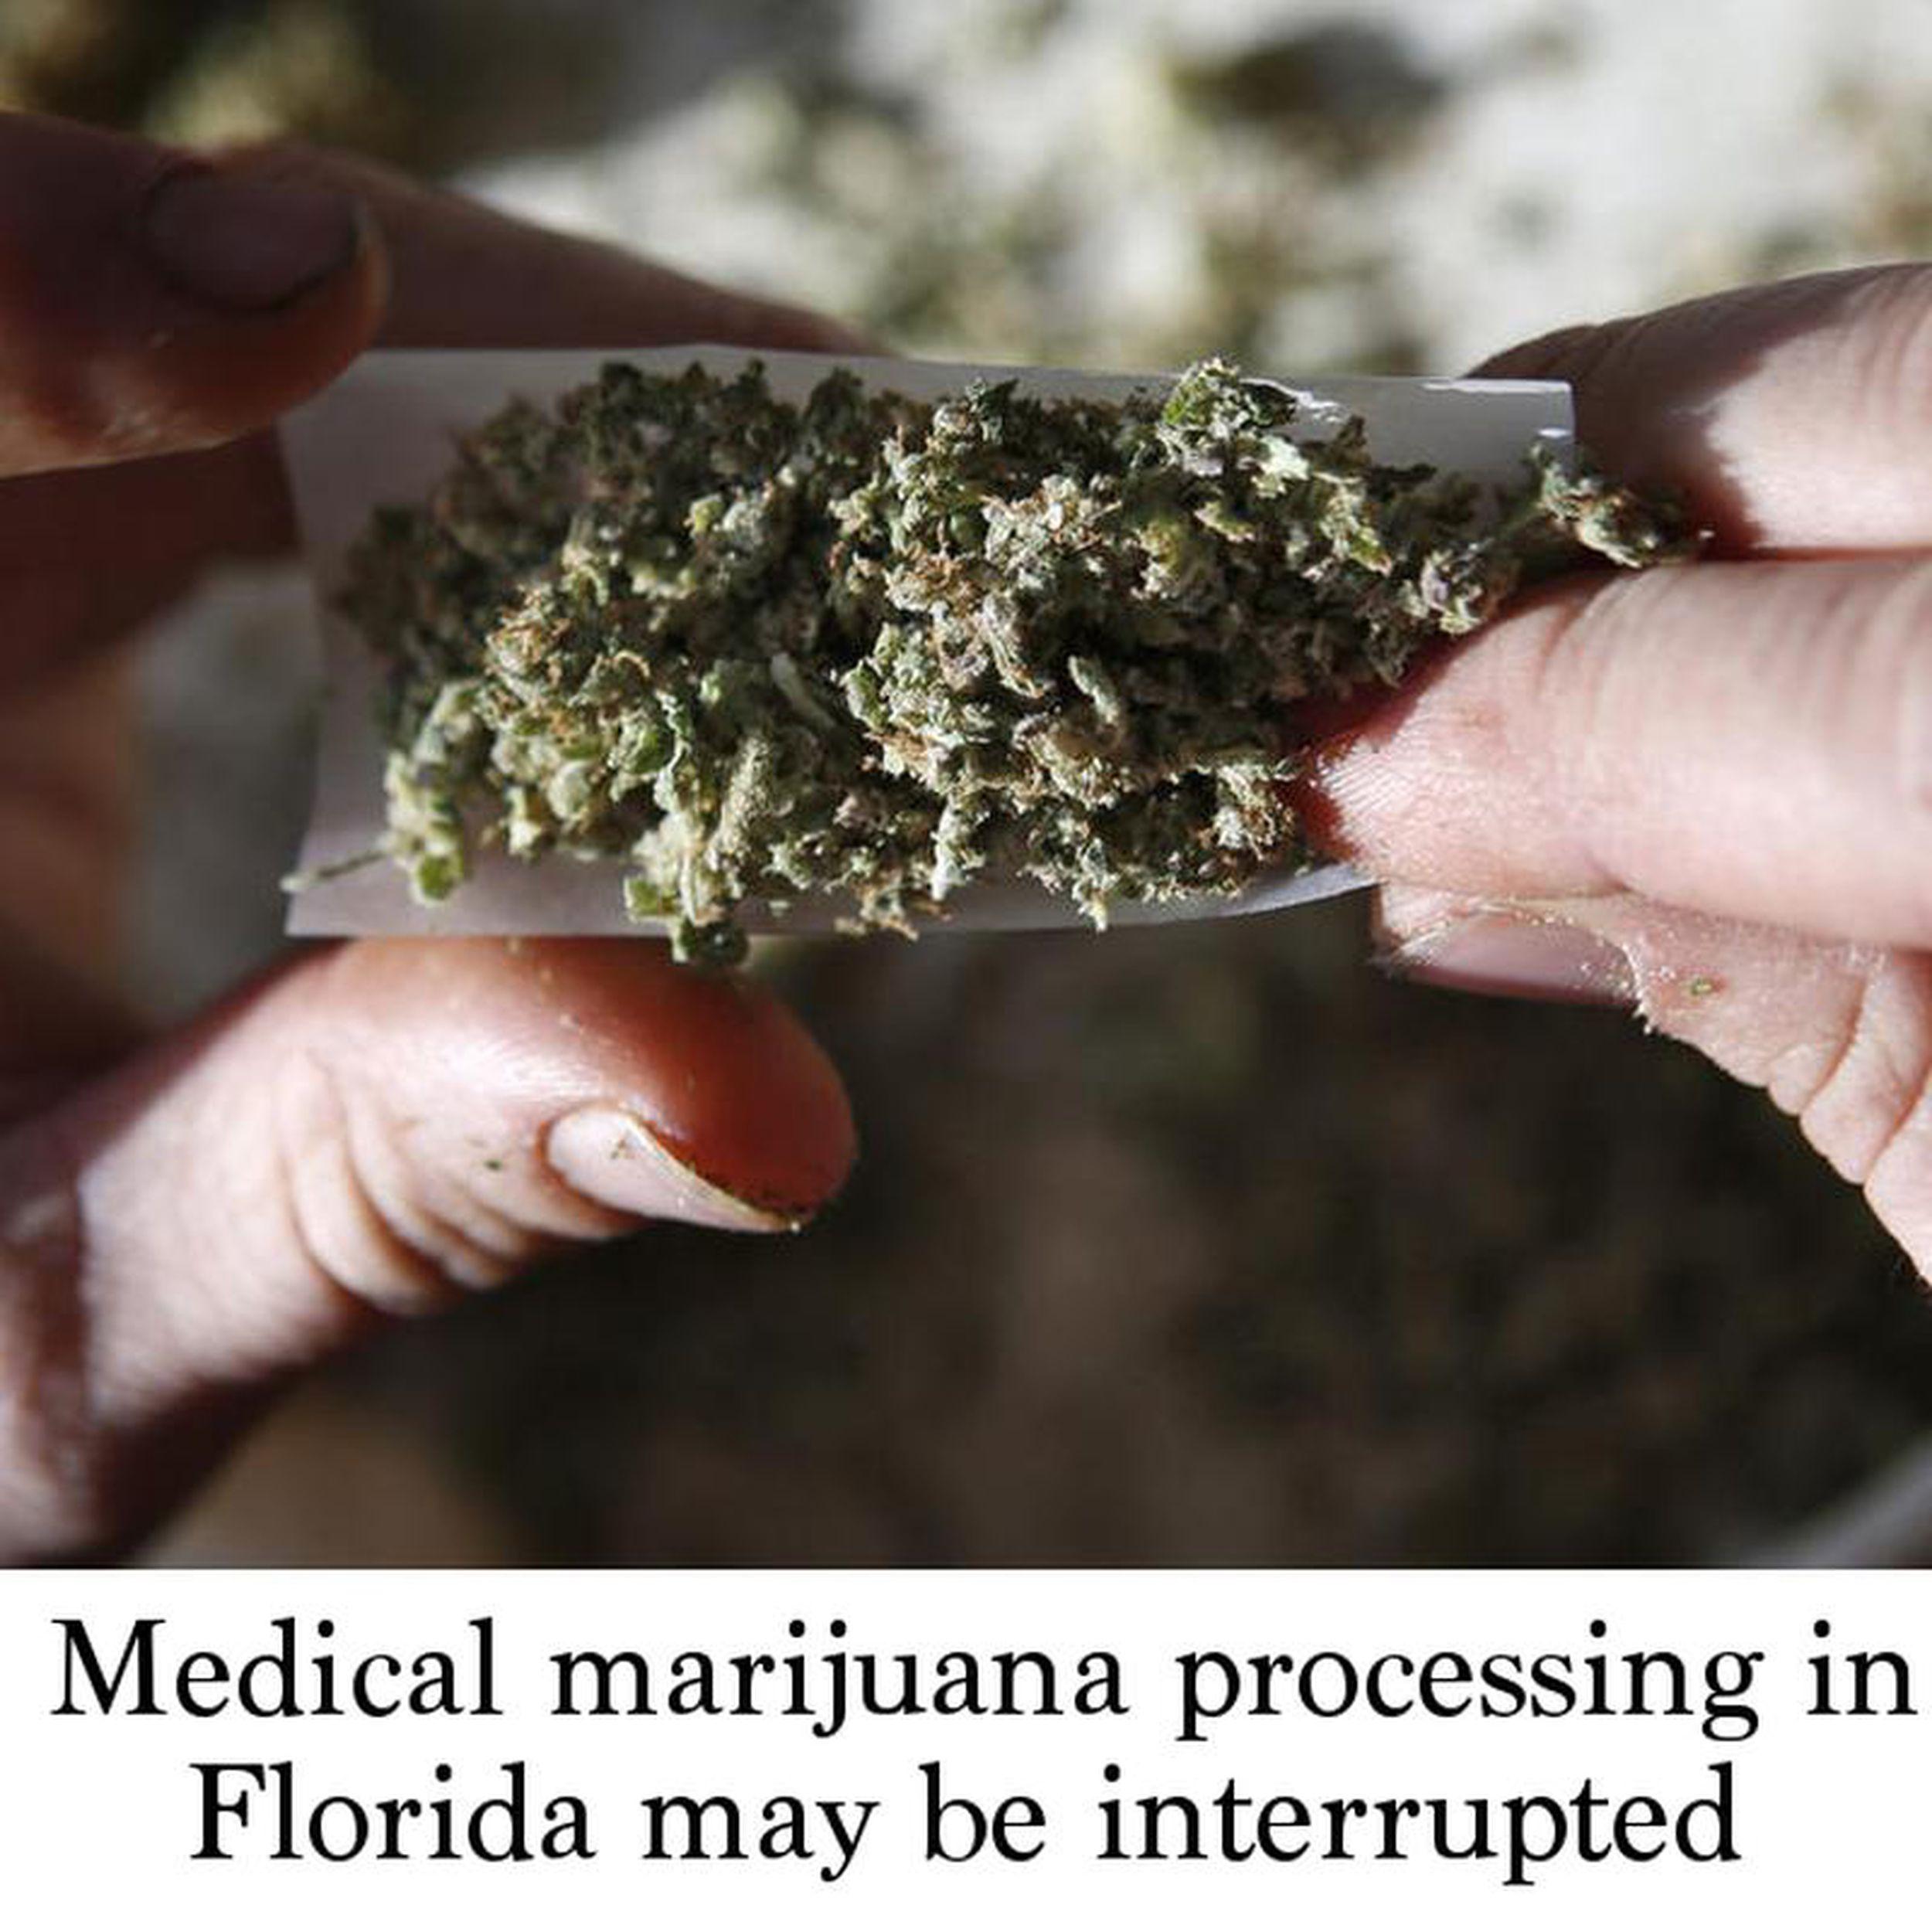 Medical marijuana processing in Florida may be interrupted